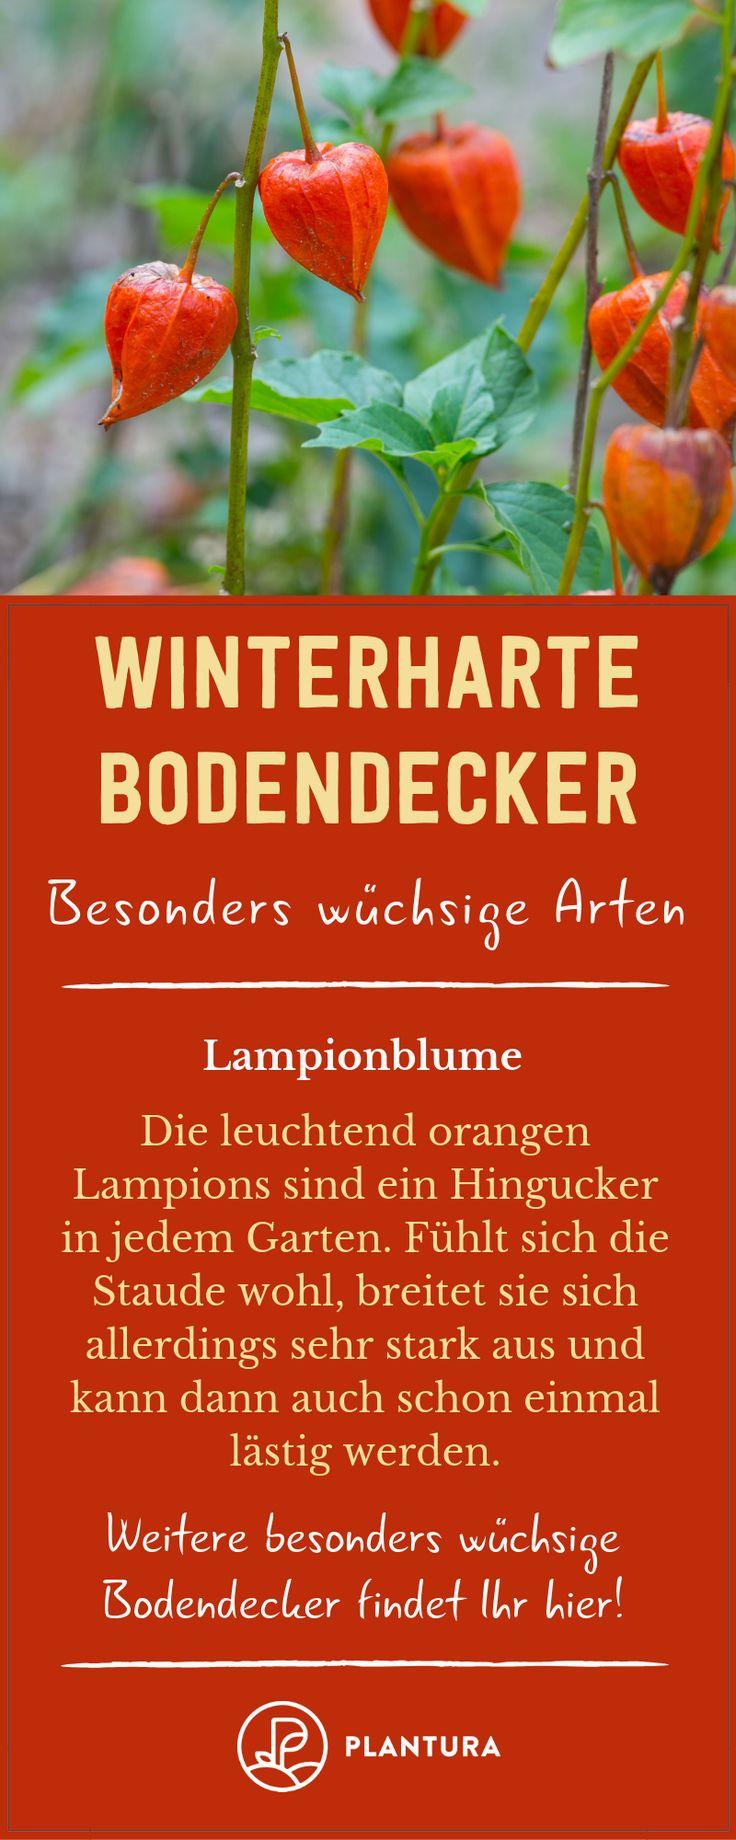 Winterharte Bodendecker: Robuste, schöne & wüchsige Sorten – Plantura | Garten Ideen & Tipps | Gemüse, Obst, Kräuter